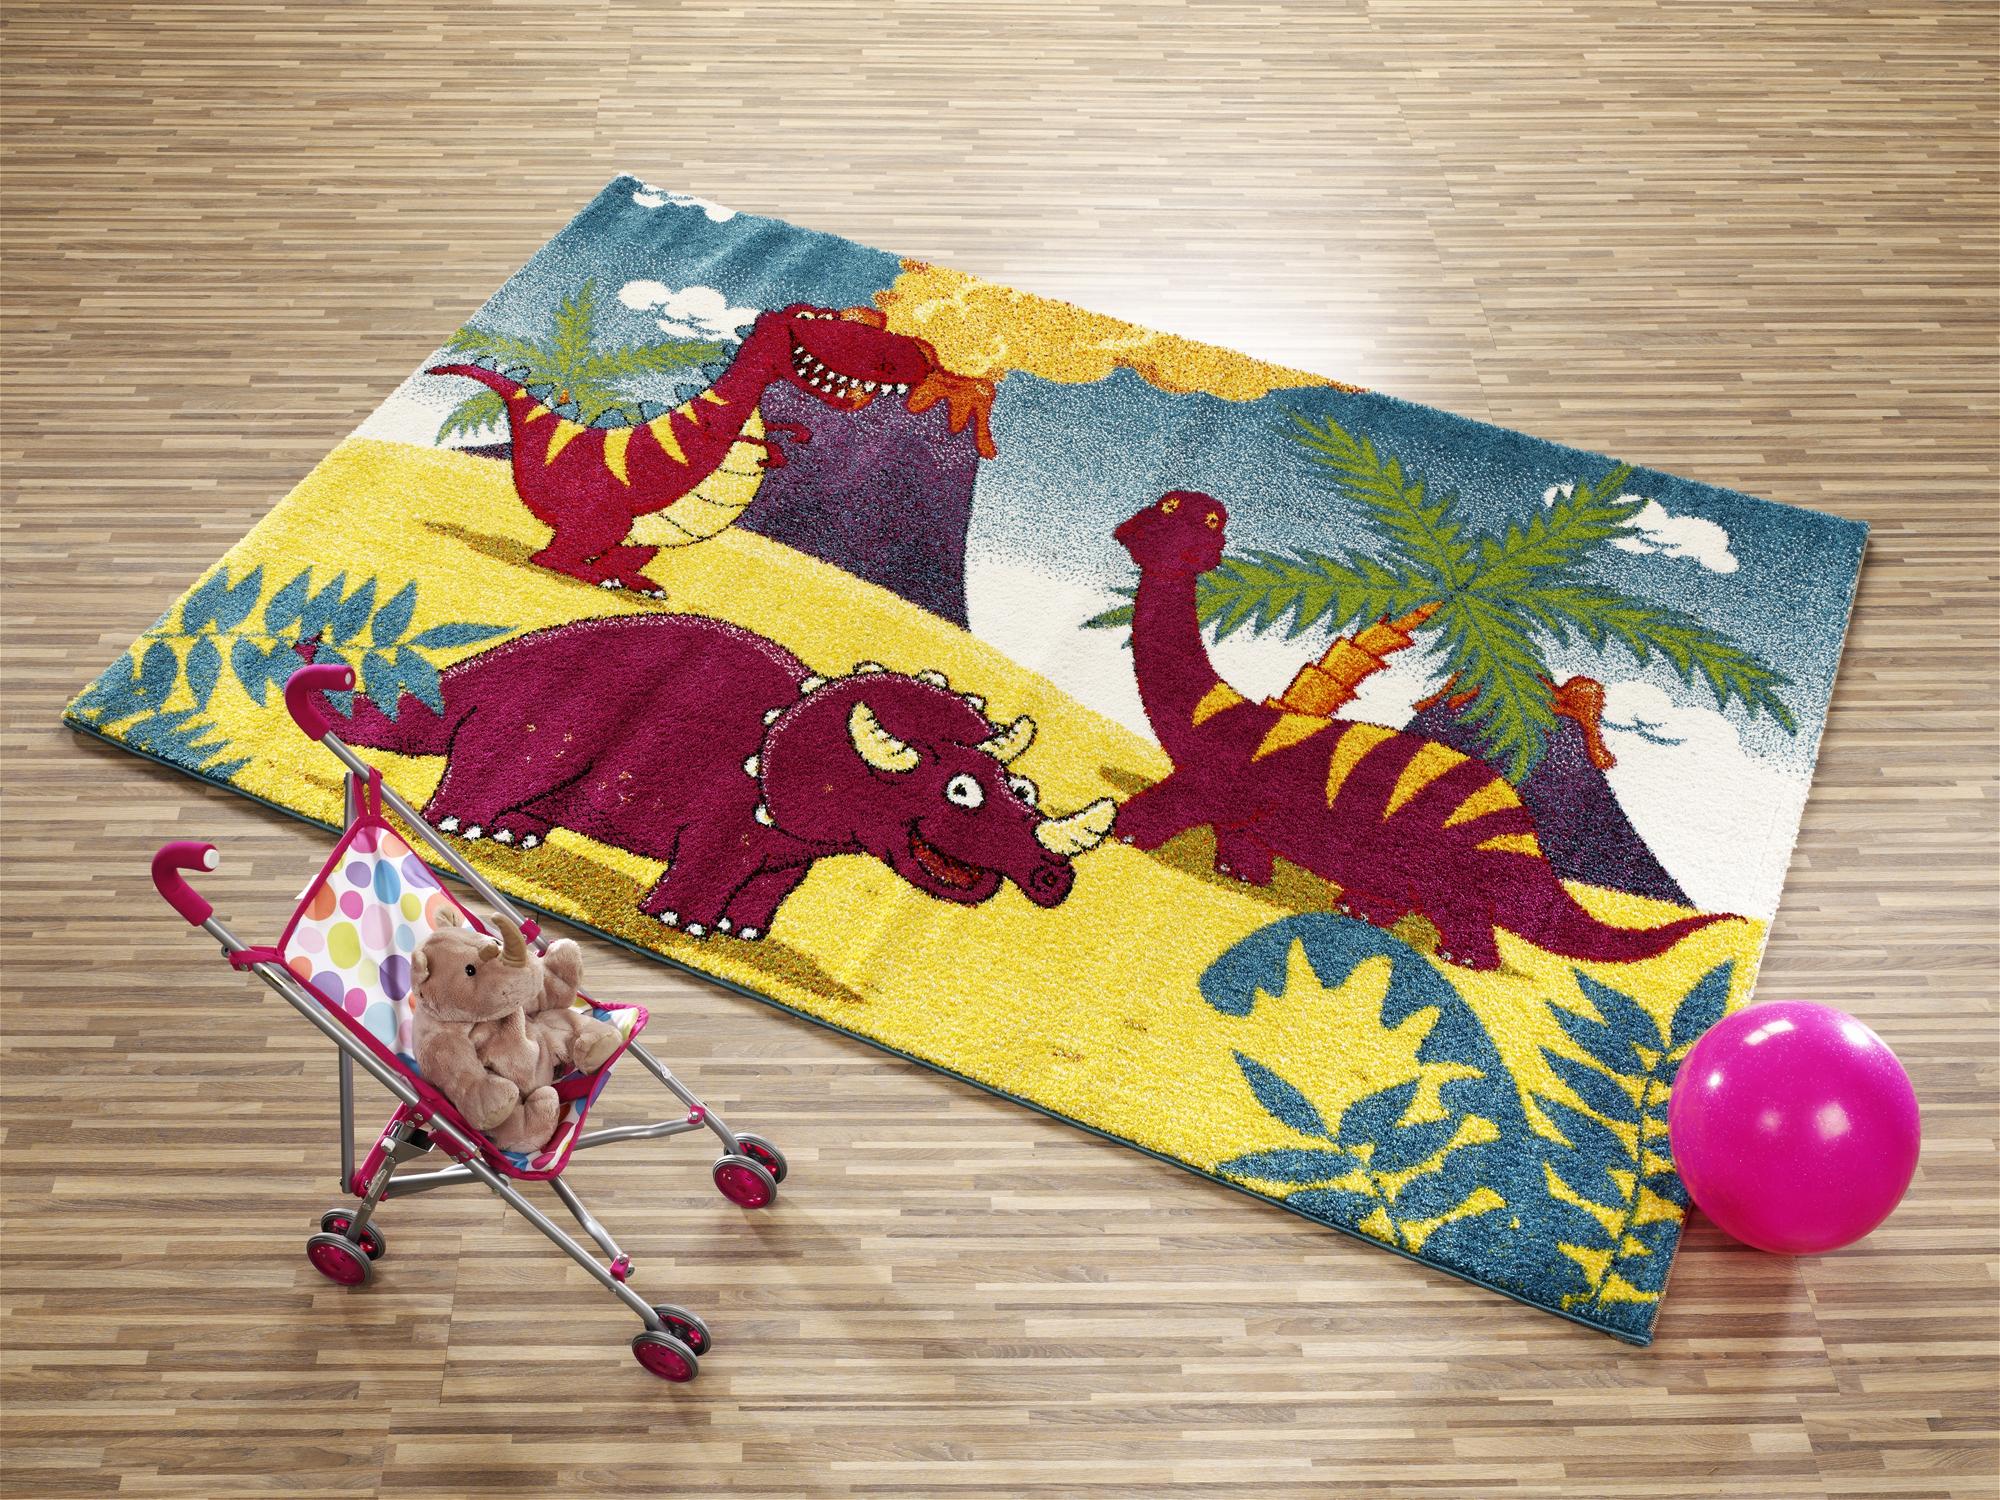 Rumtober Dino Kinder Teppich Bunt öko Tex